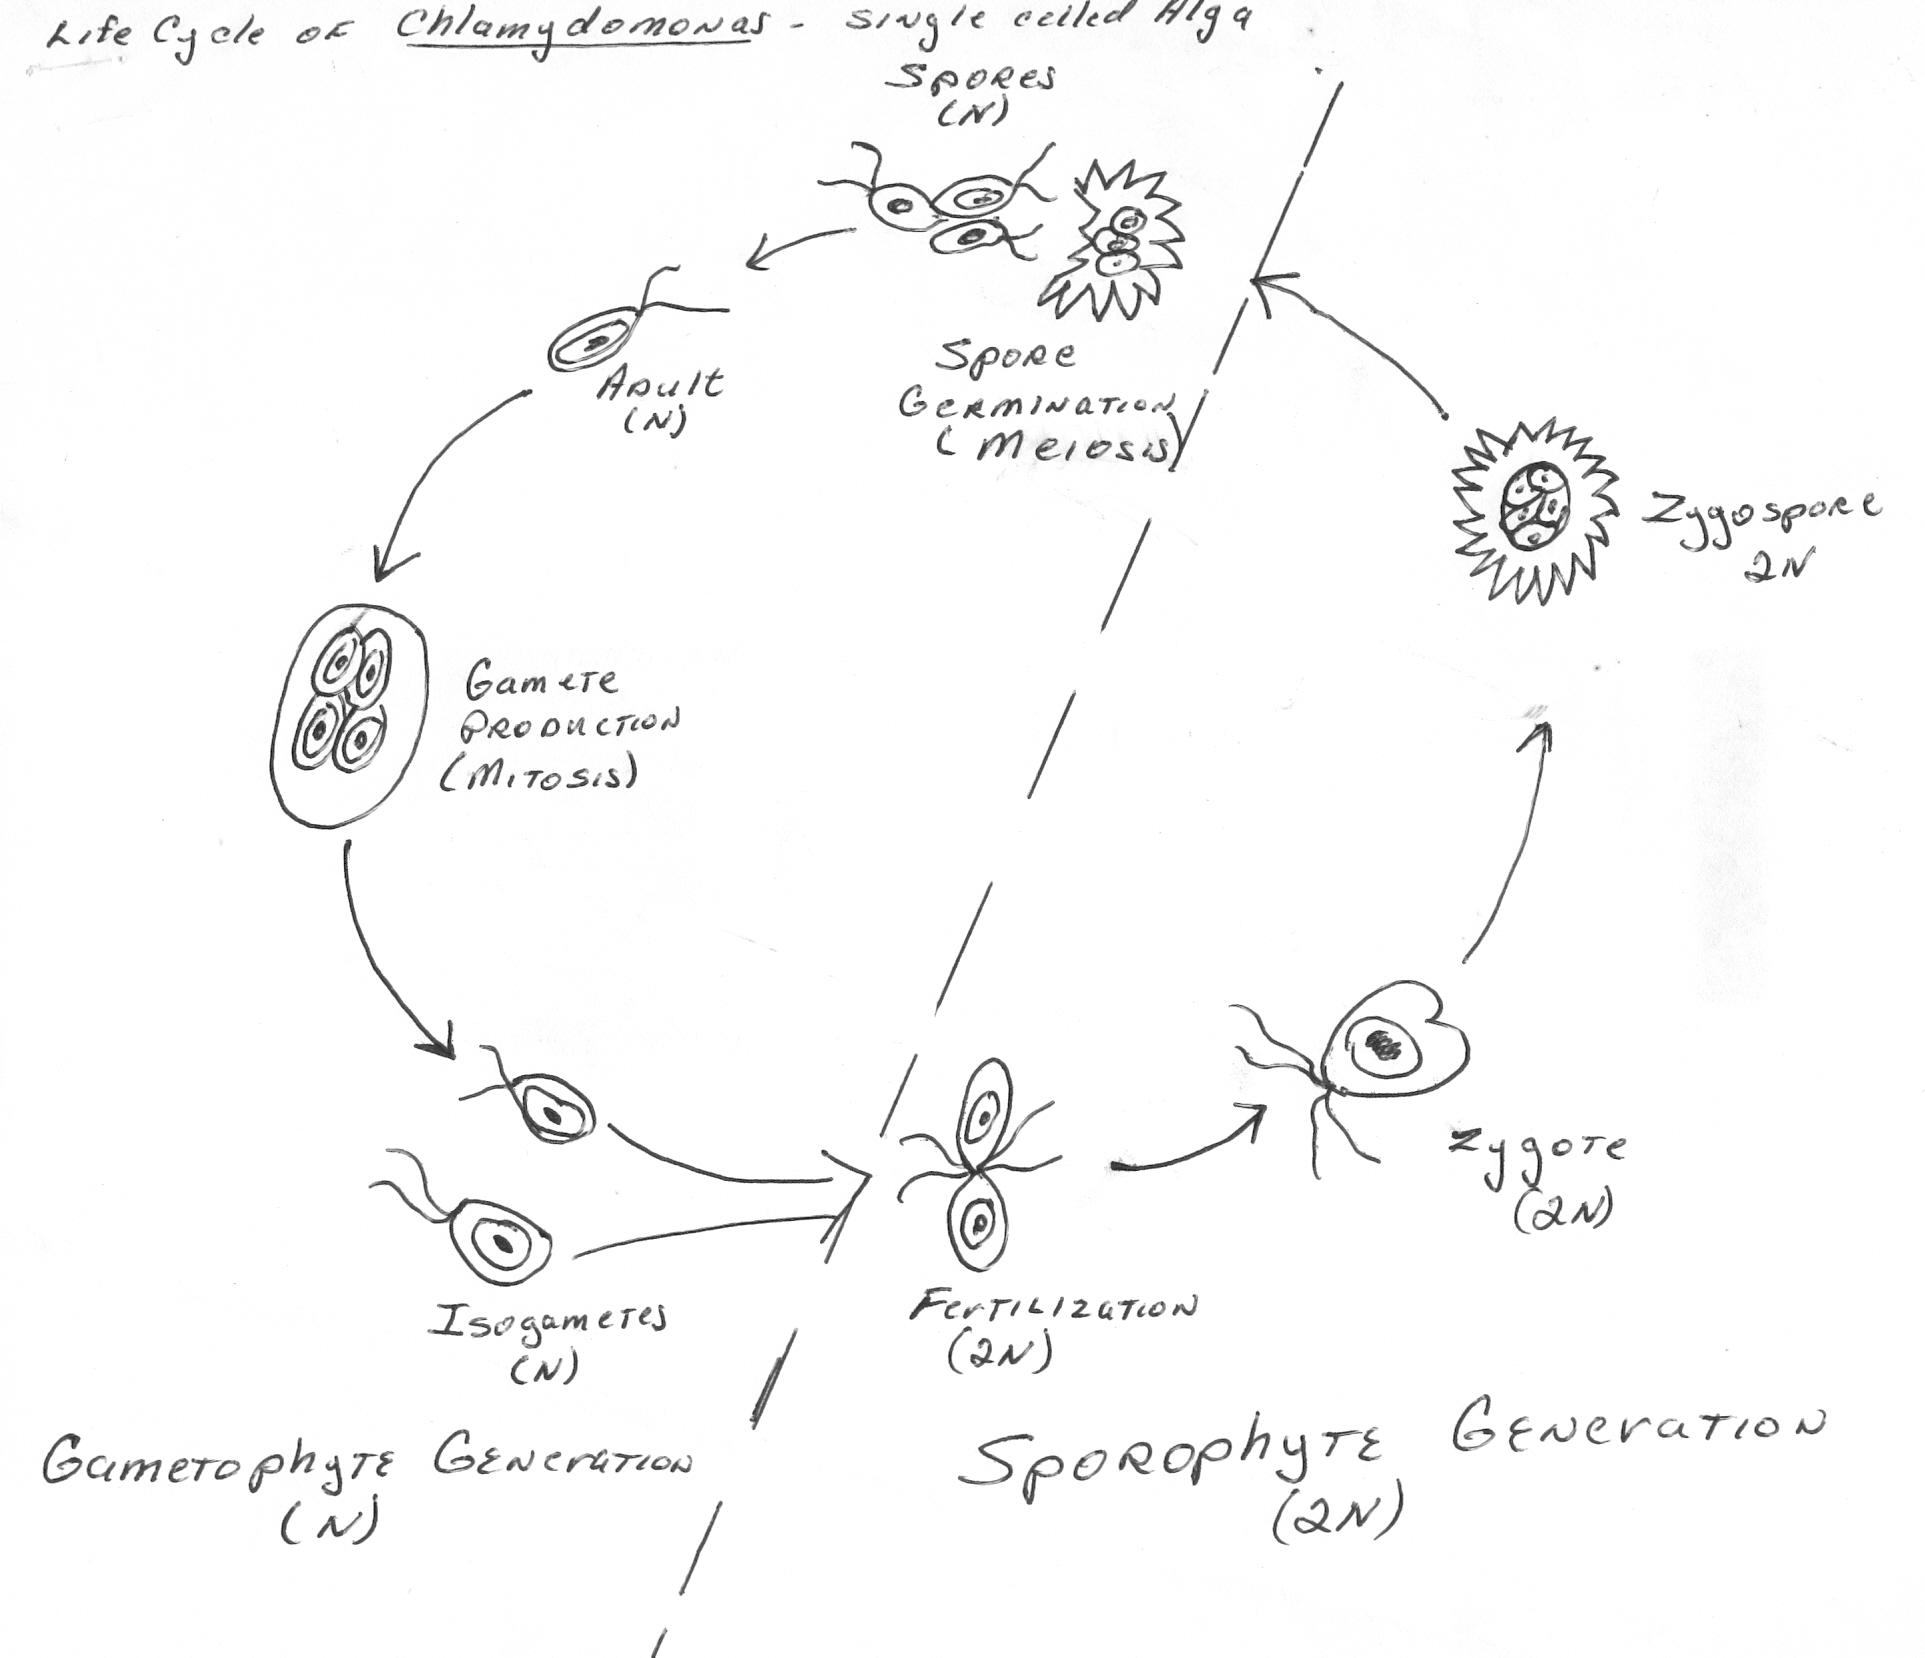 File:Alga Life Cycle.jpg - Wikimedia Commons